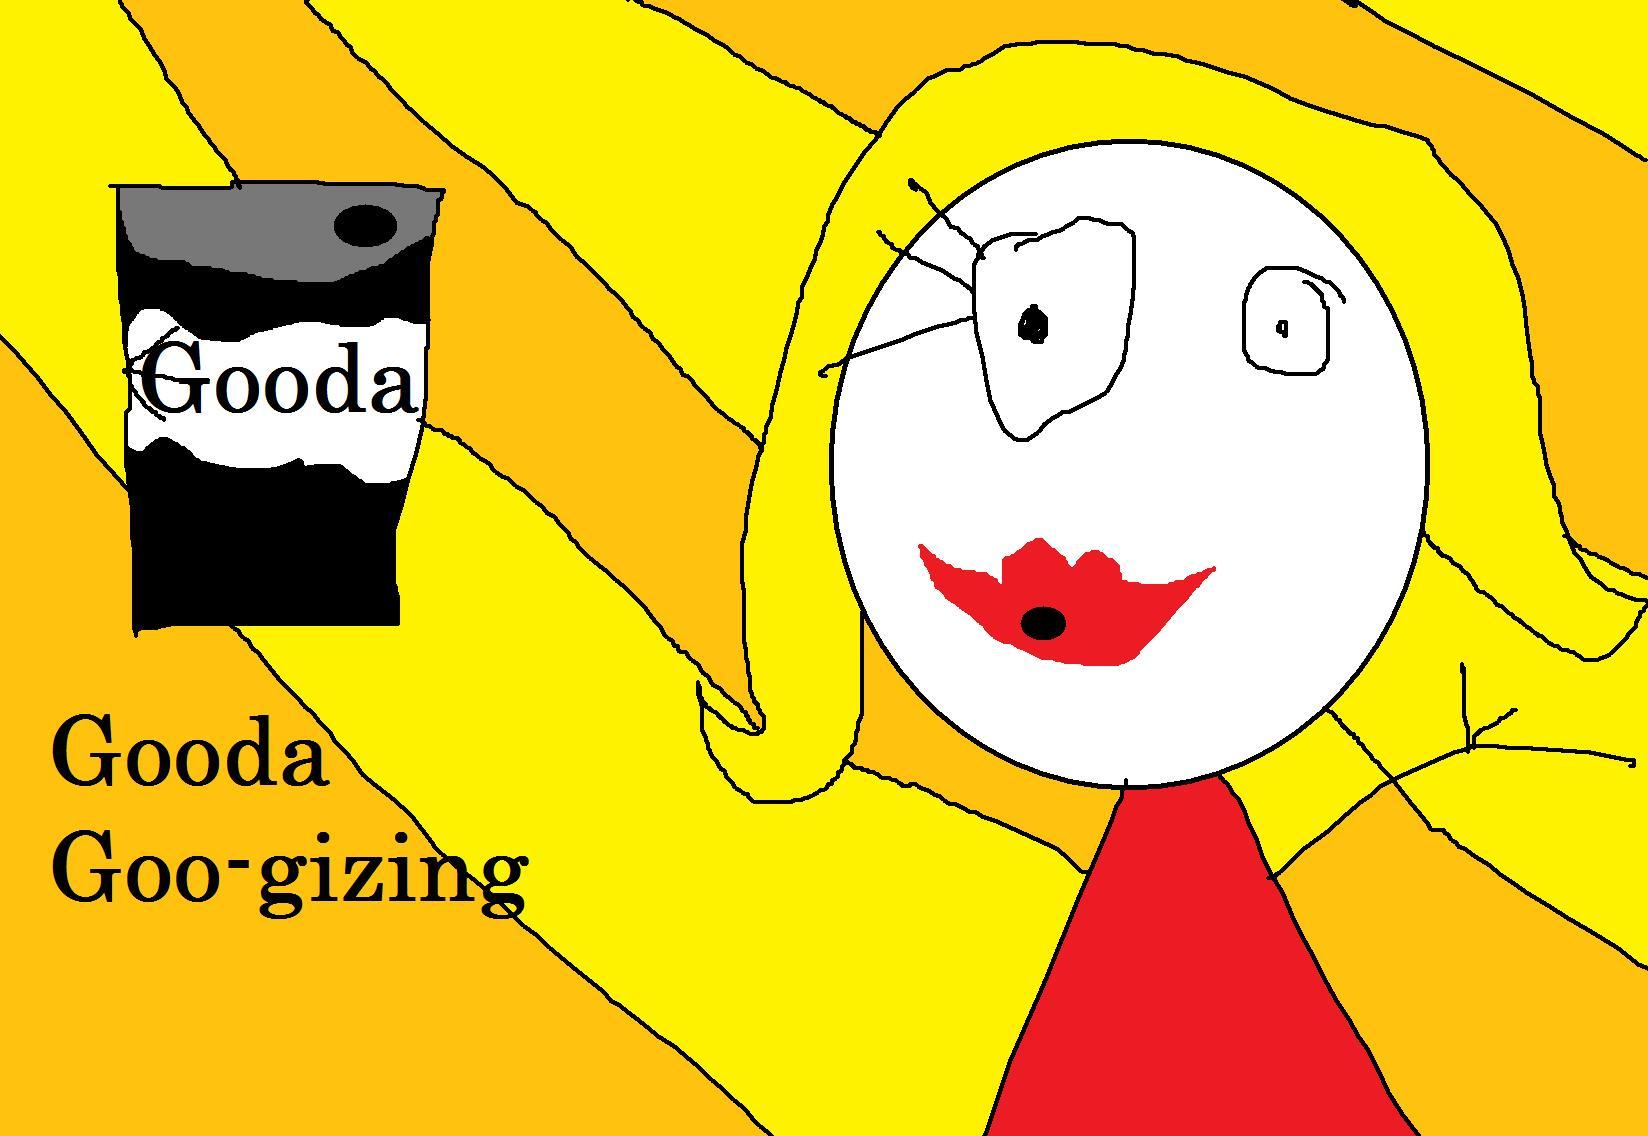 Gooda